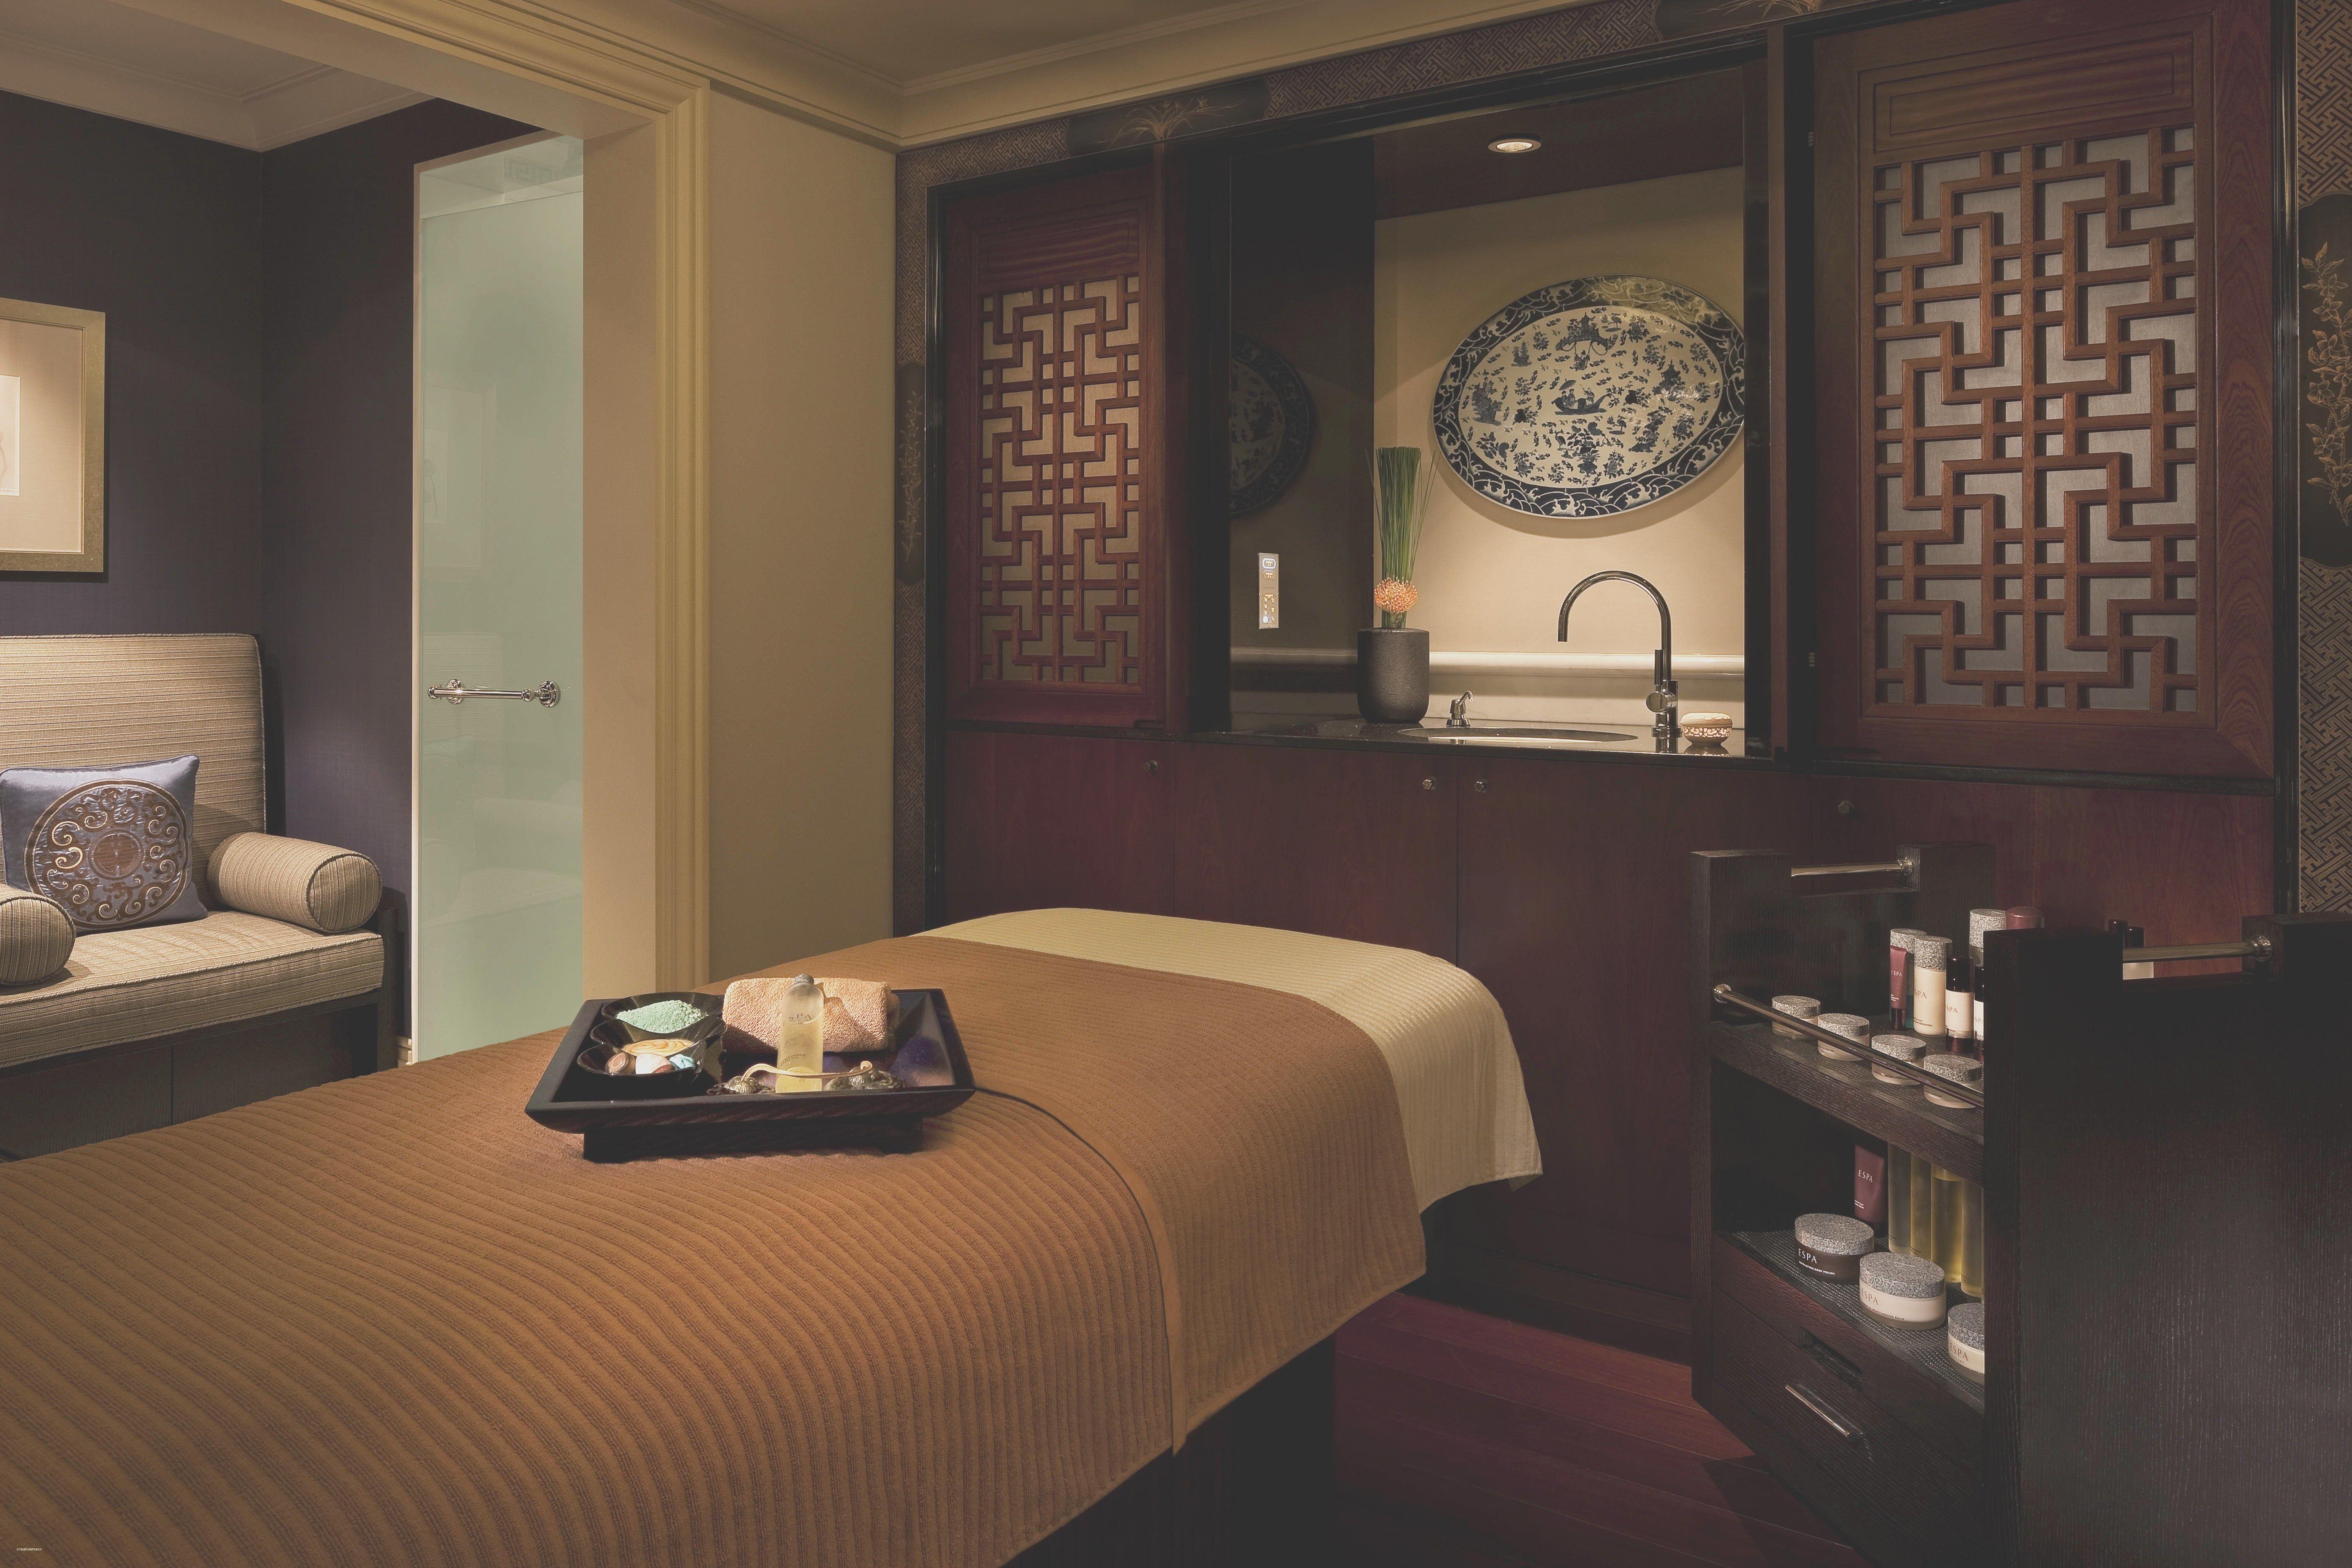 Luxury Spa Decor Ideas Estheticians With 25 Photos